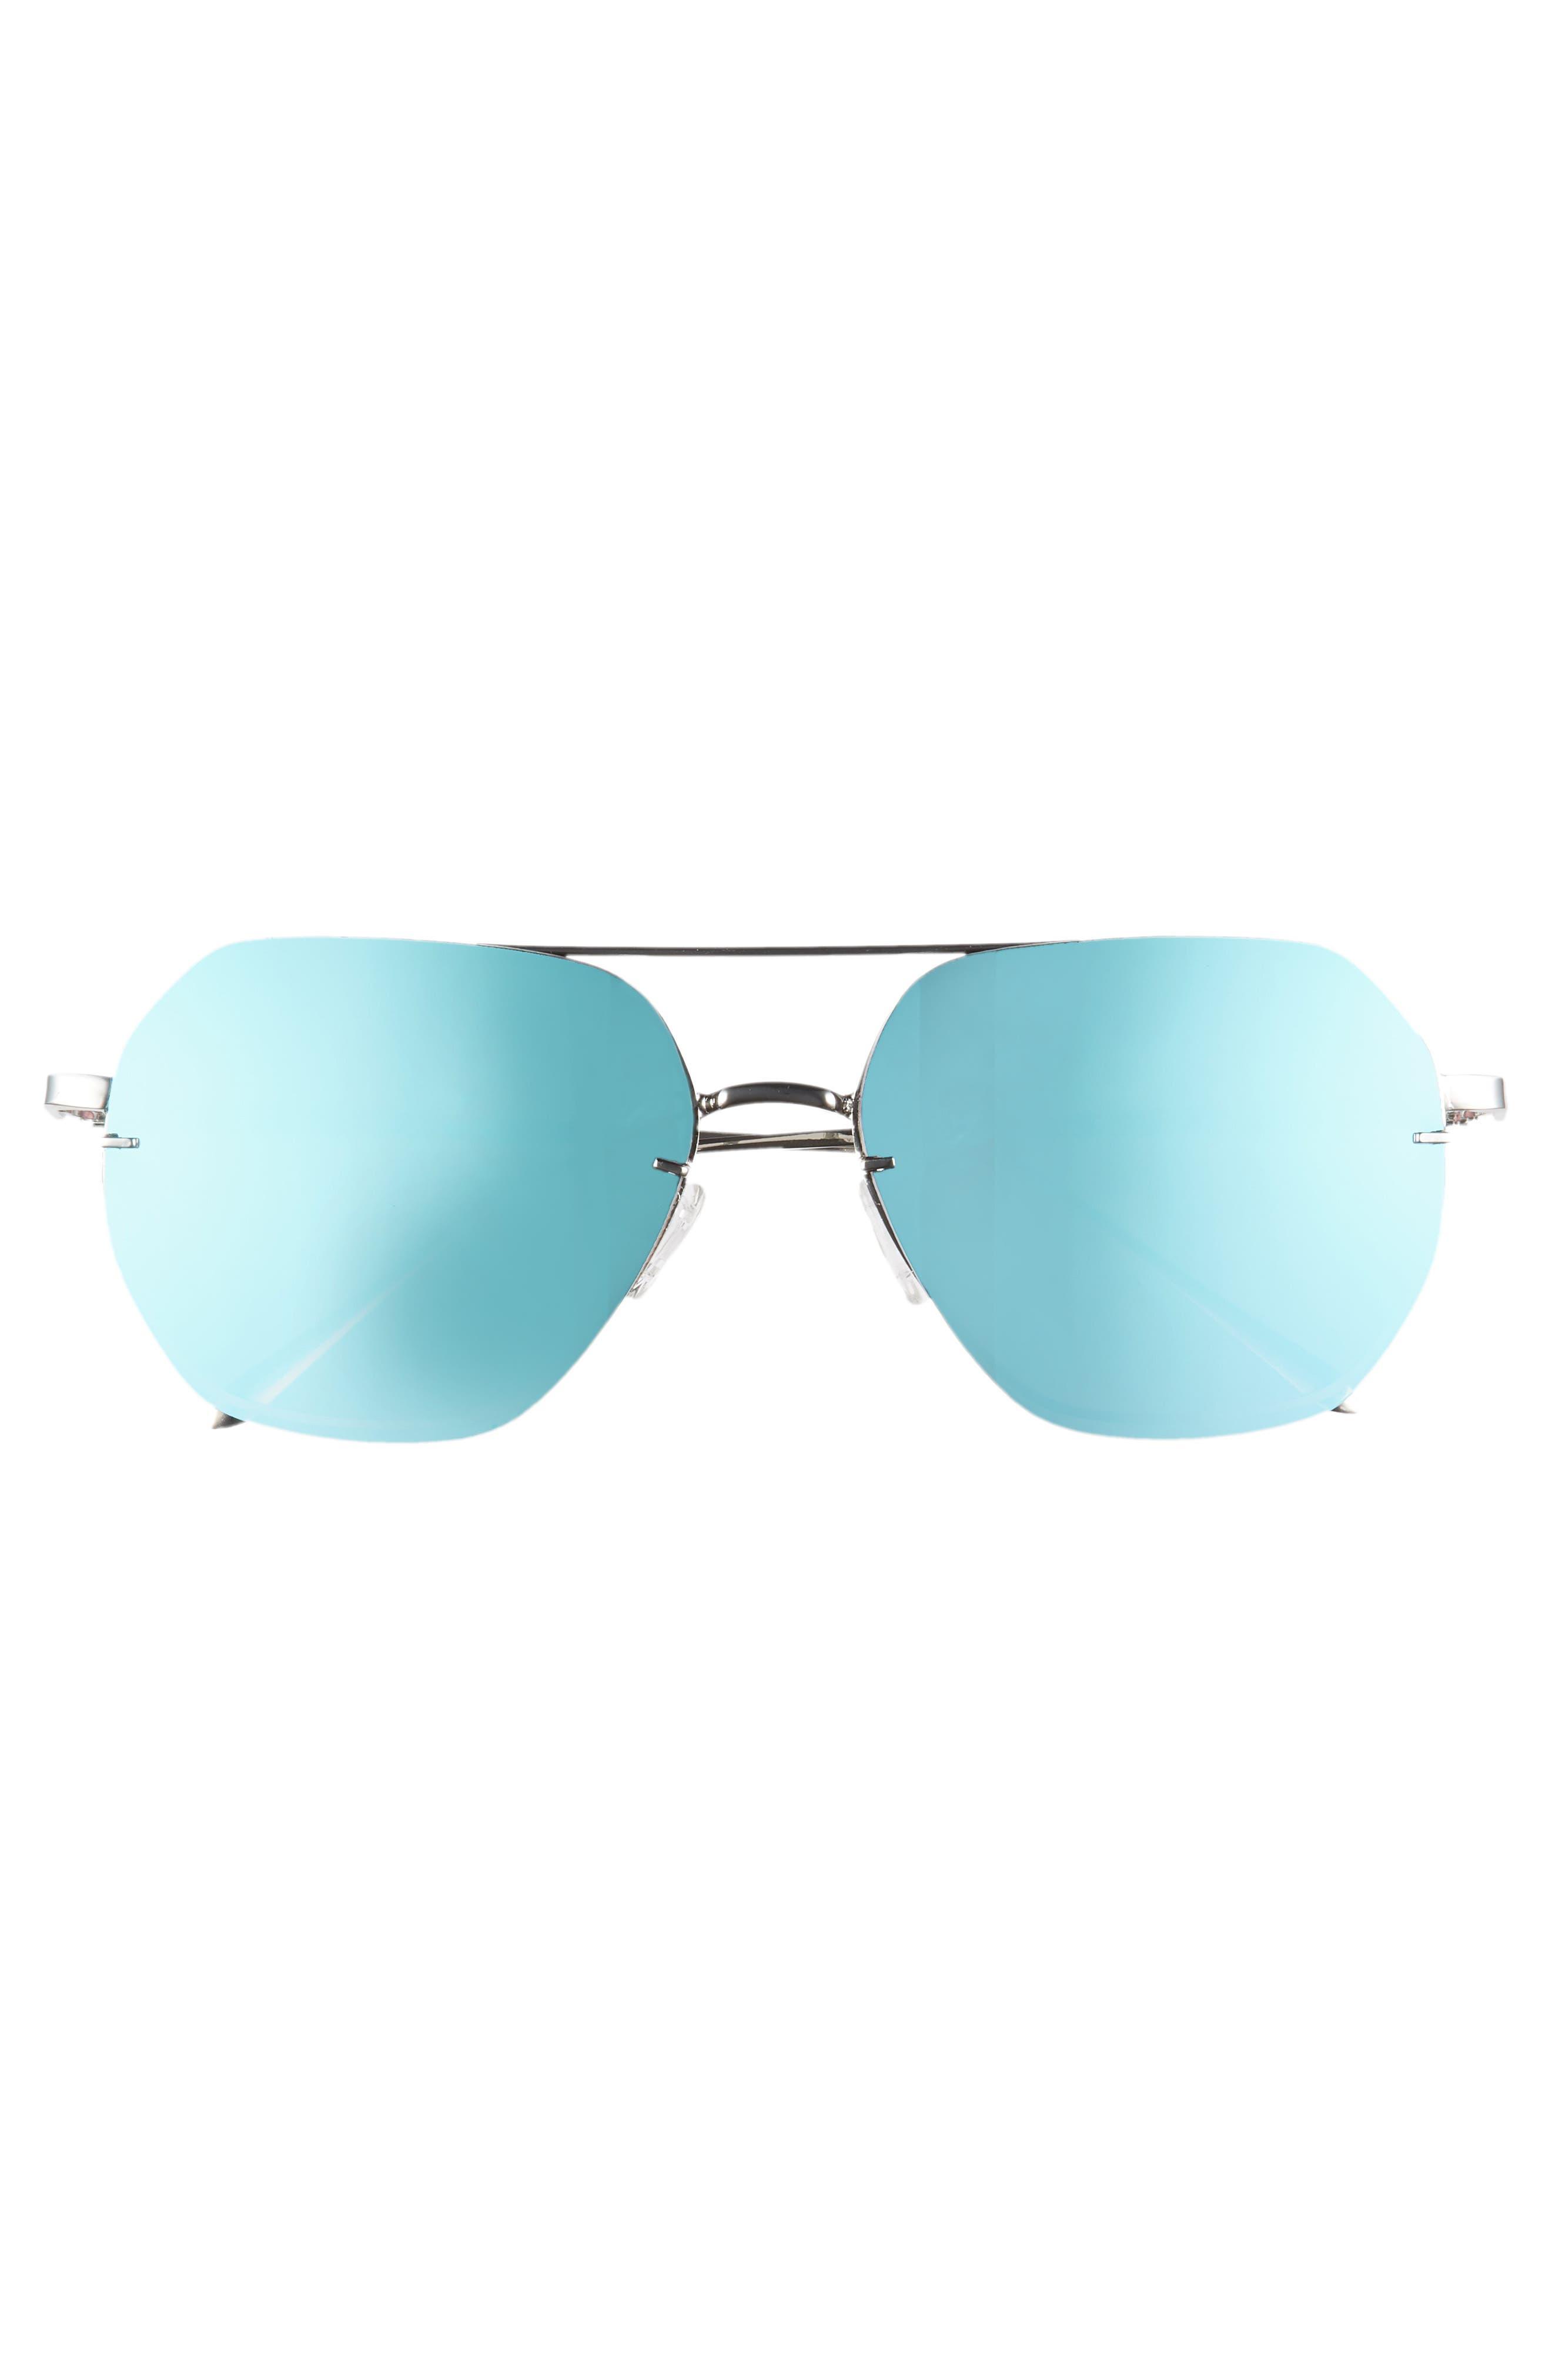 62mm Metal Flat Geo Aviator Sunglasses,                             Alternate thumbnail 3, color,                             040